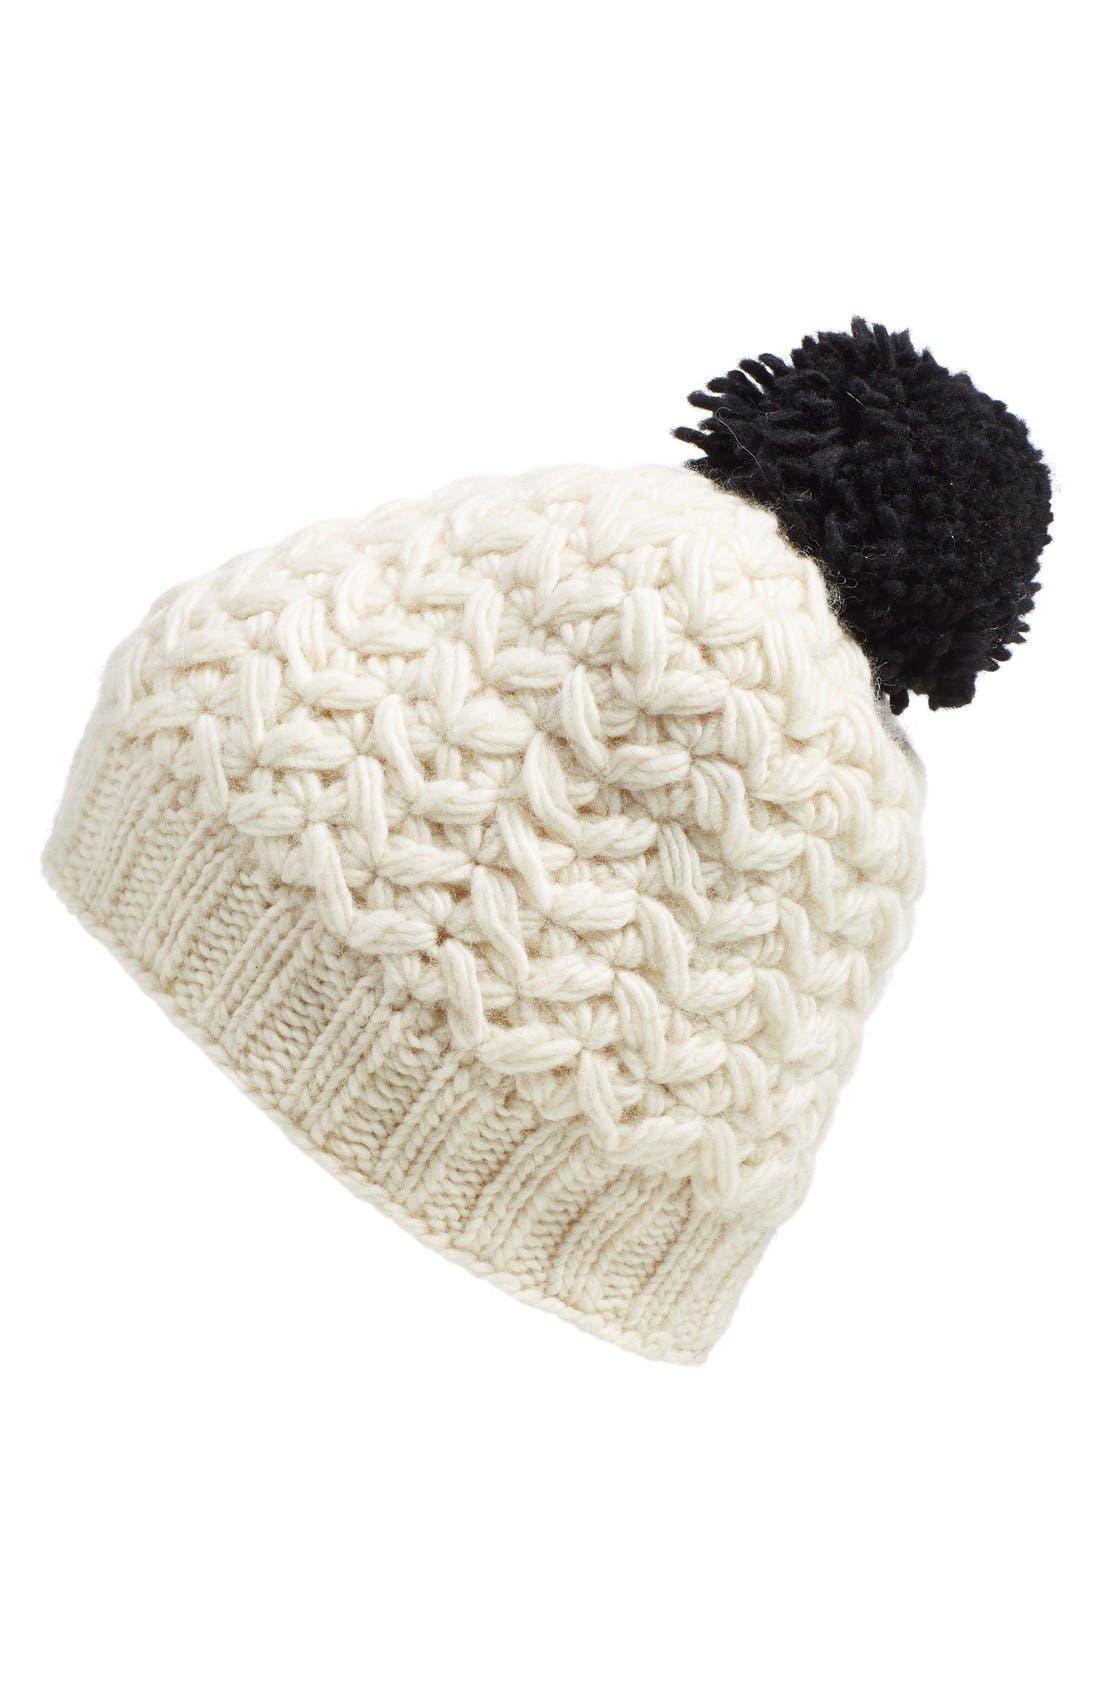 Alternate Image 1 Selected - Nirvanna Designs 'Black Pom' Knit Beanie